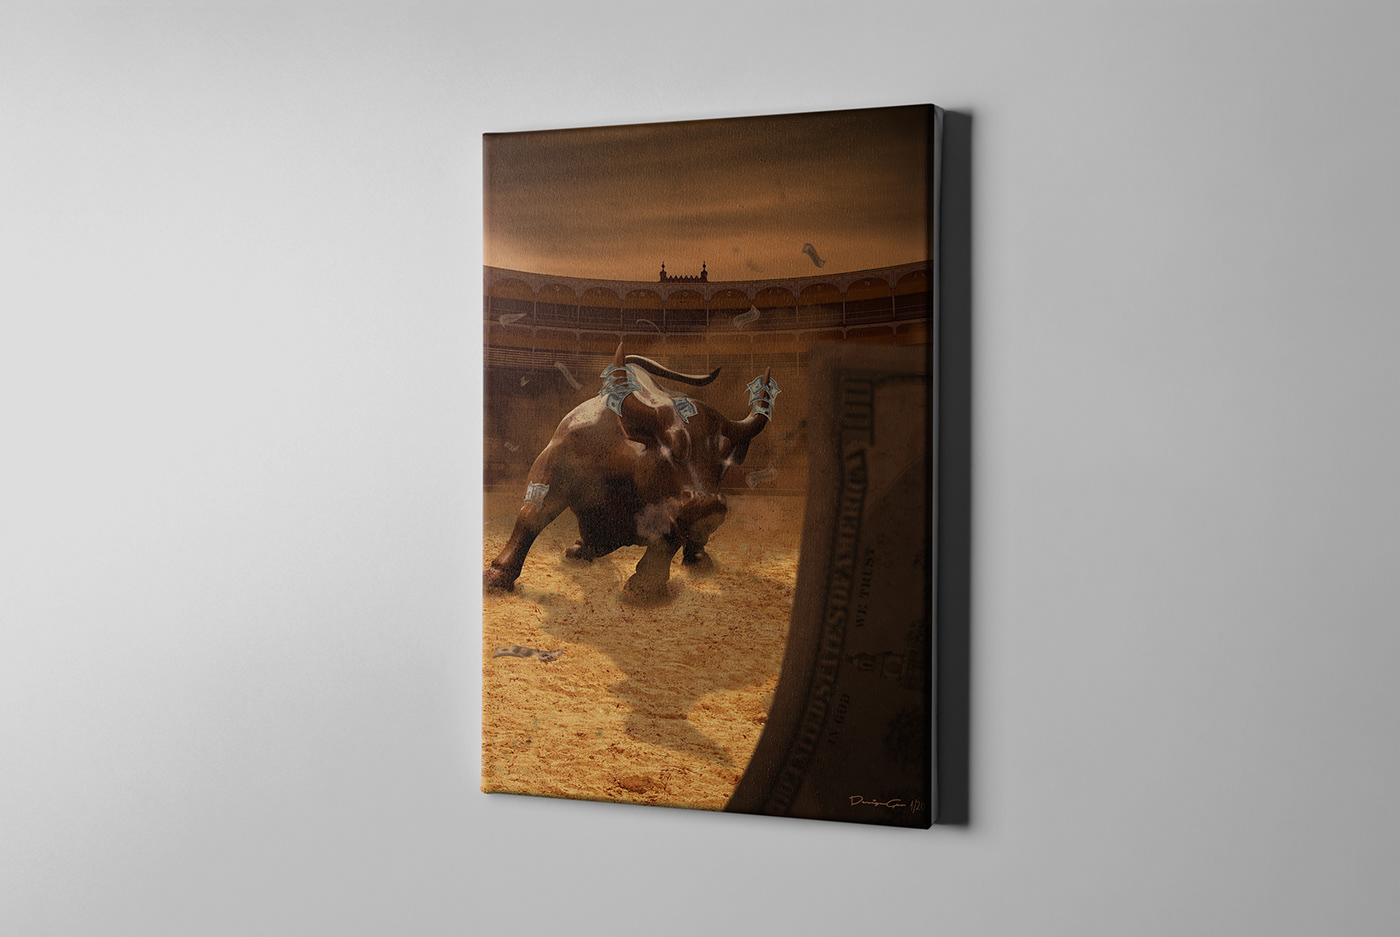 Rampant photo manipulation canvas print. DesignGeo